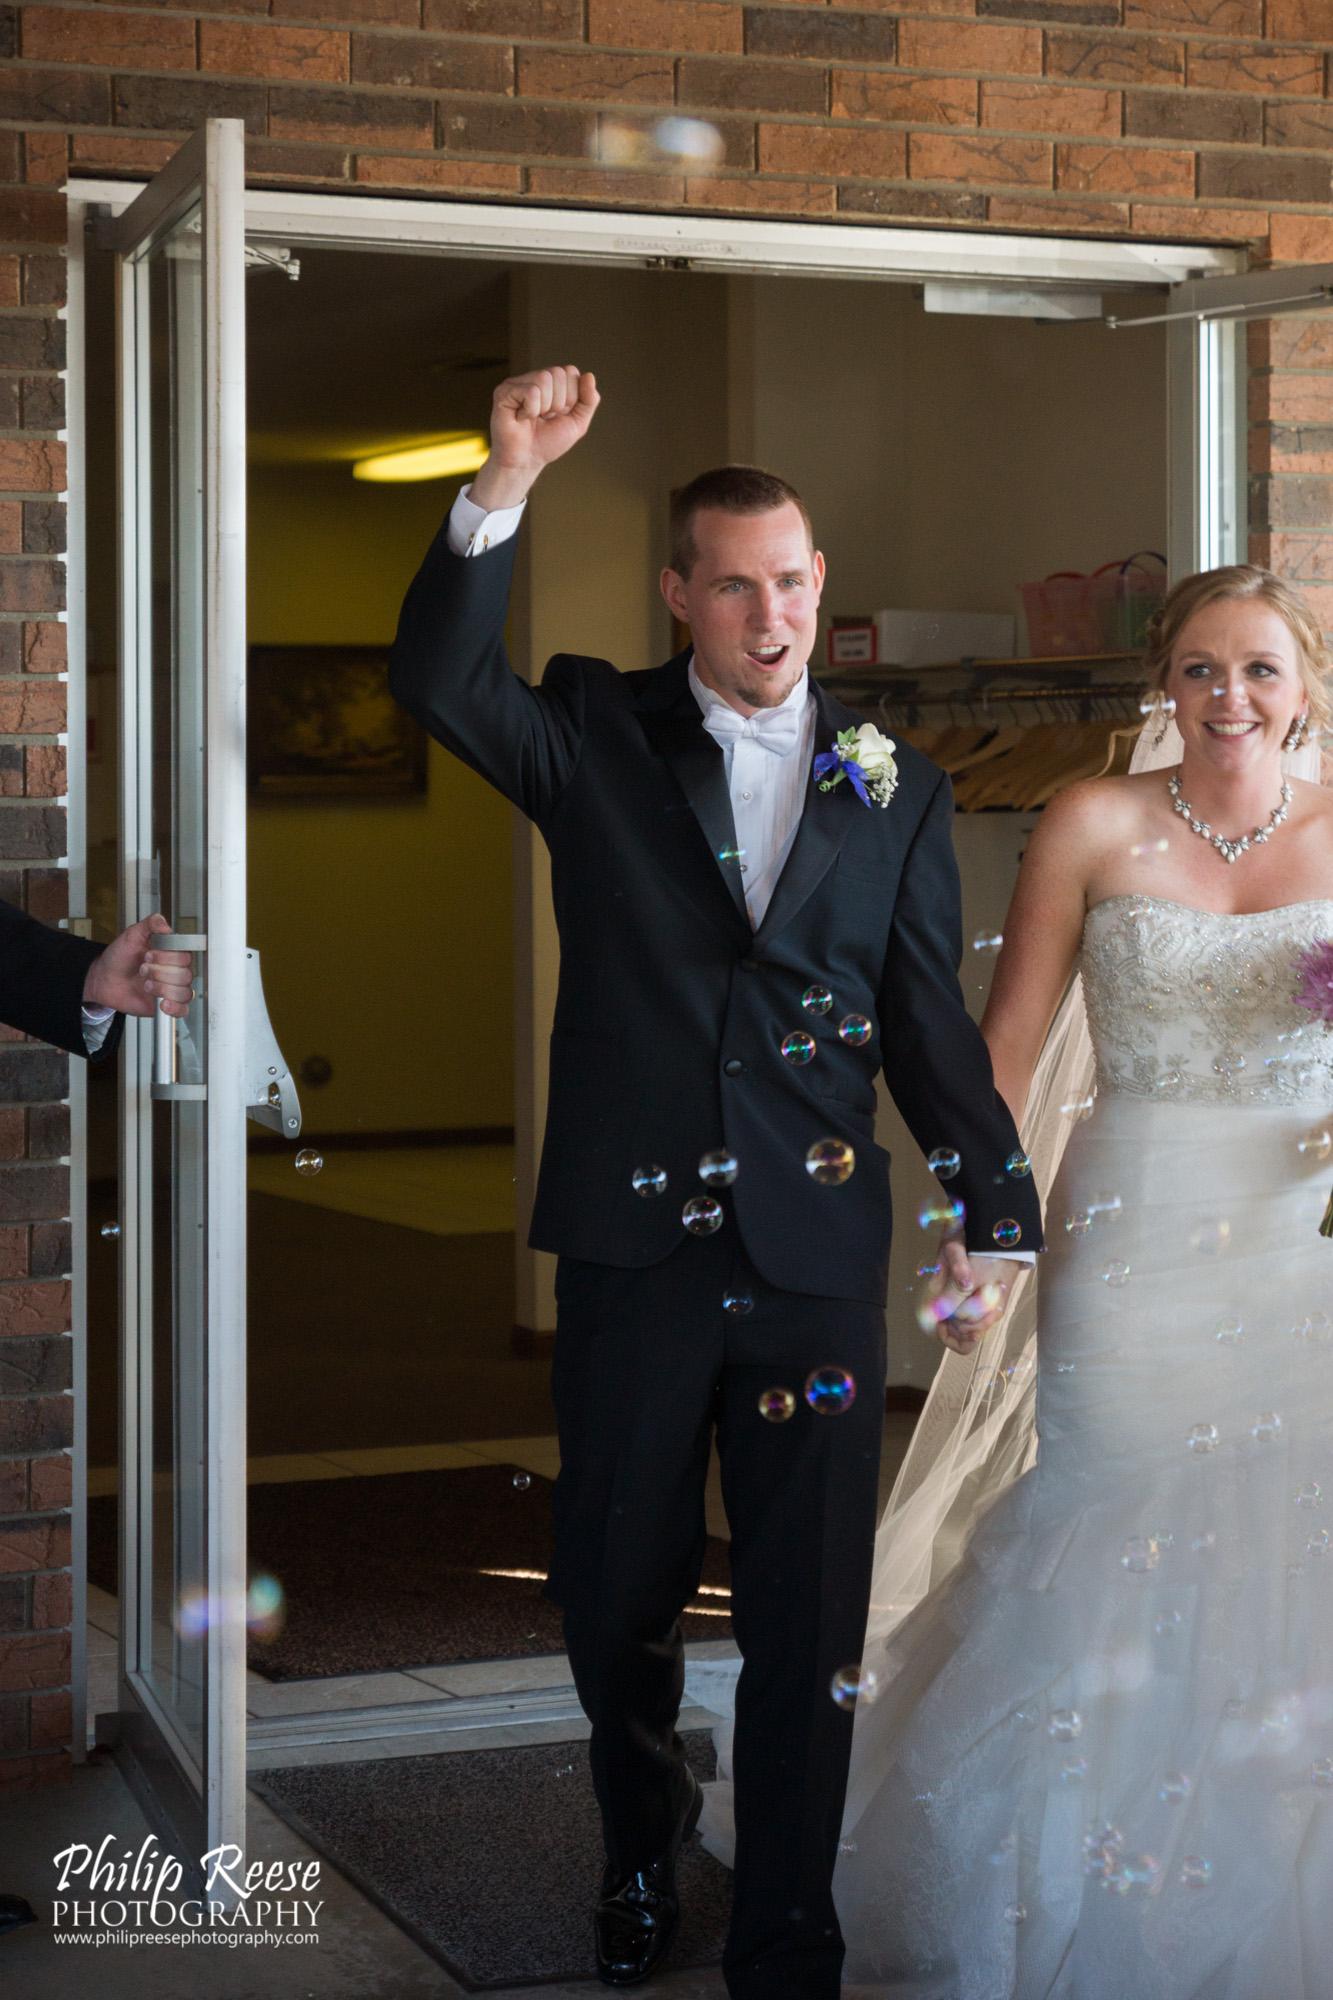 Bruder Wedding 167 - 08643.jpg